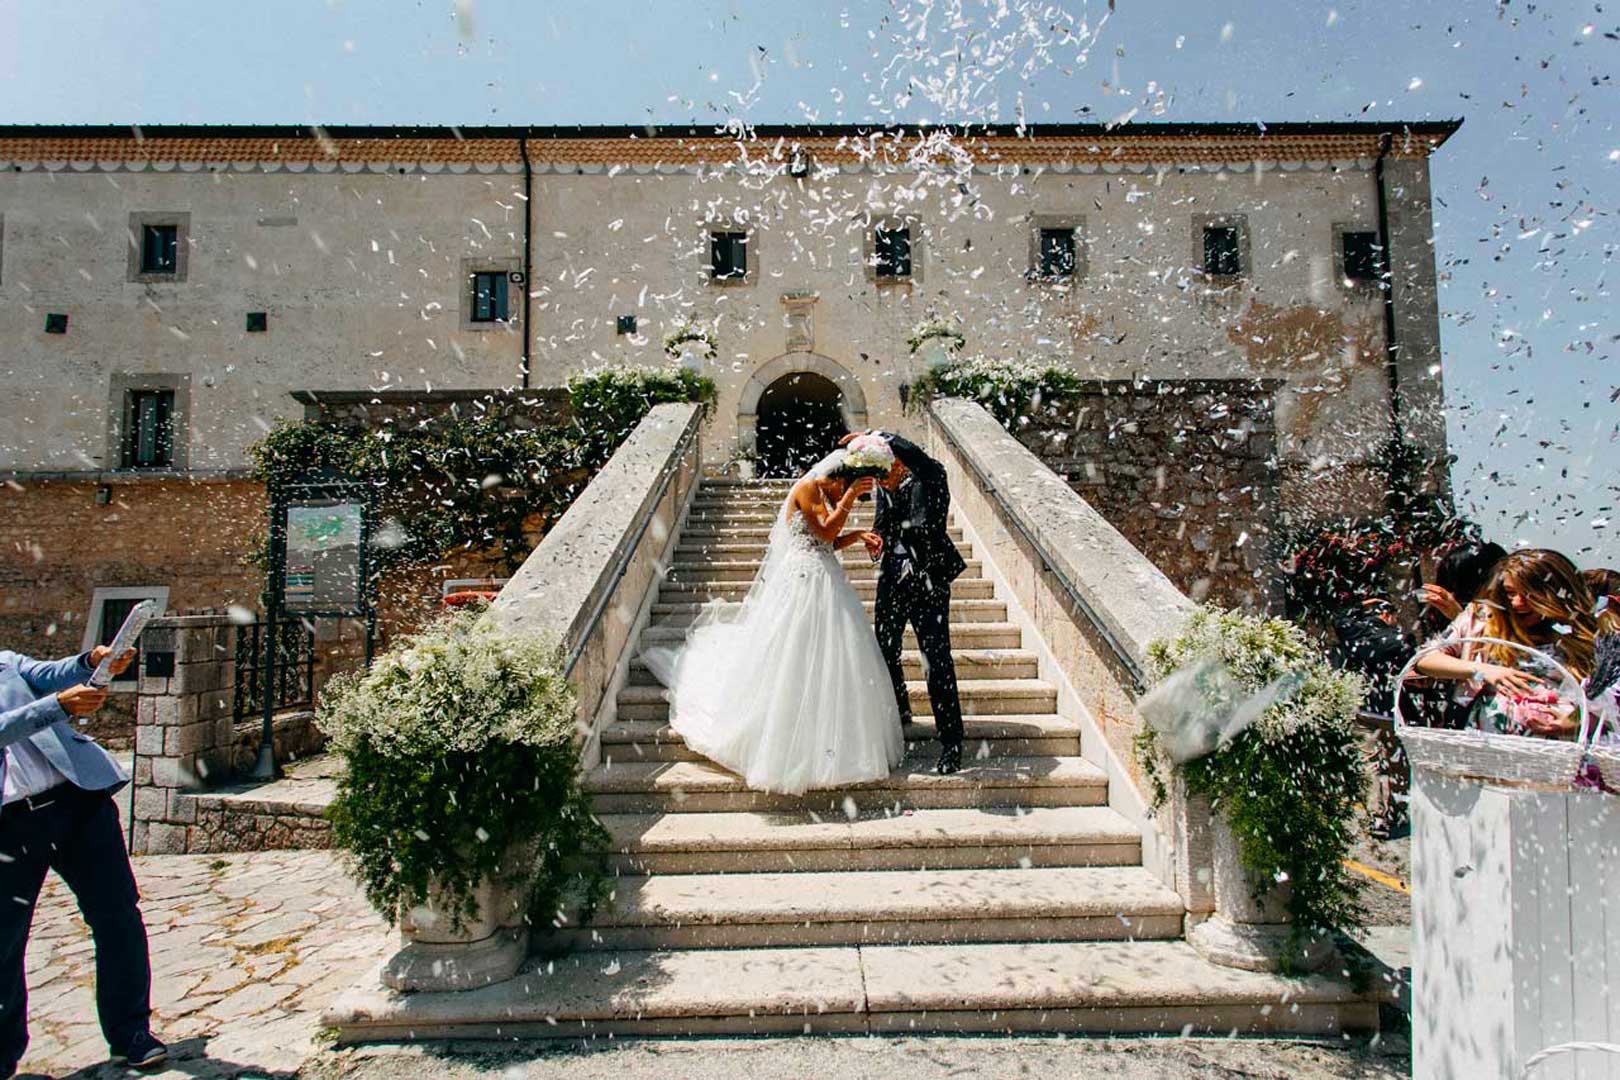 020-san-marco-in-lamis-gianni-lepore-wedding-photographer